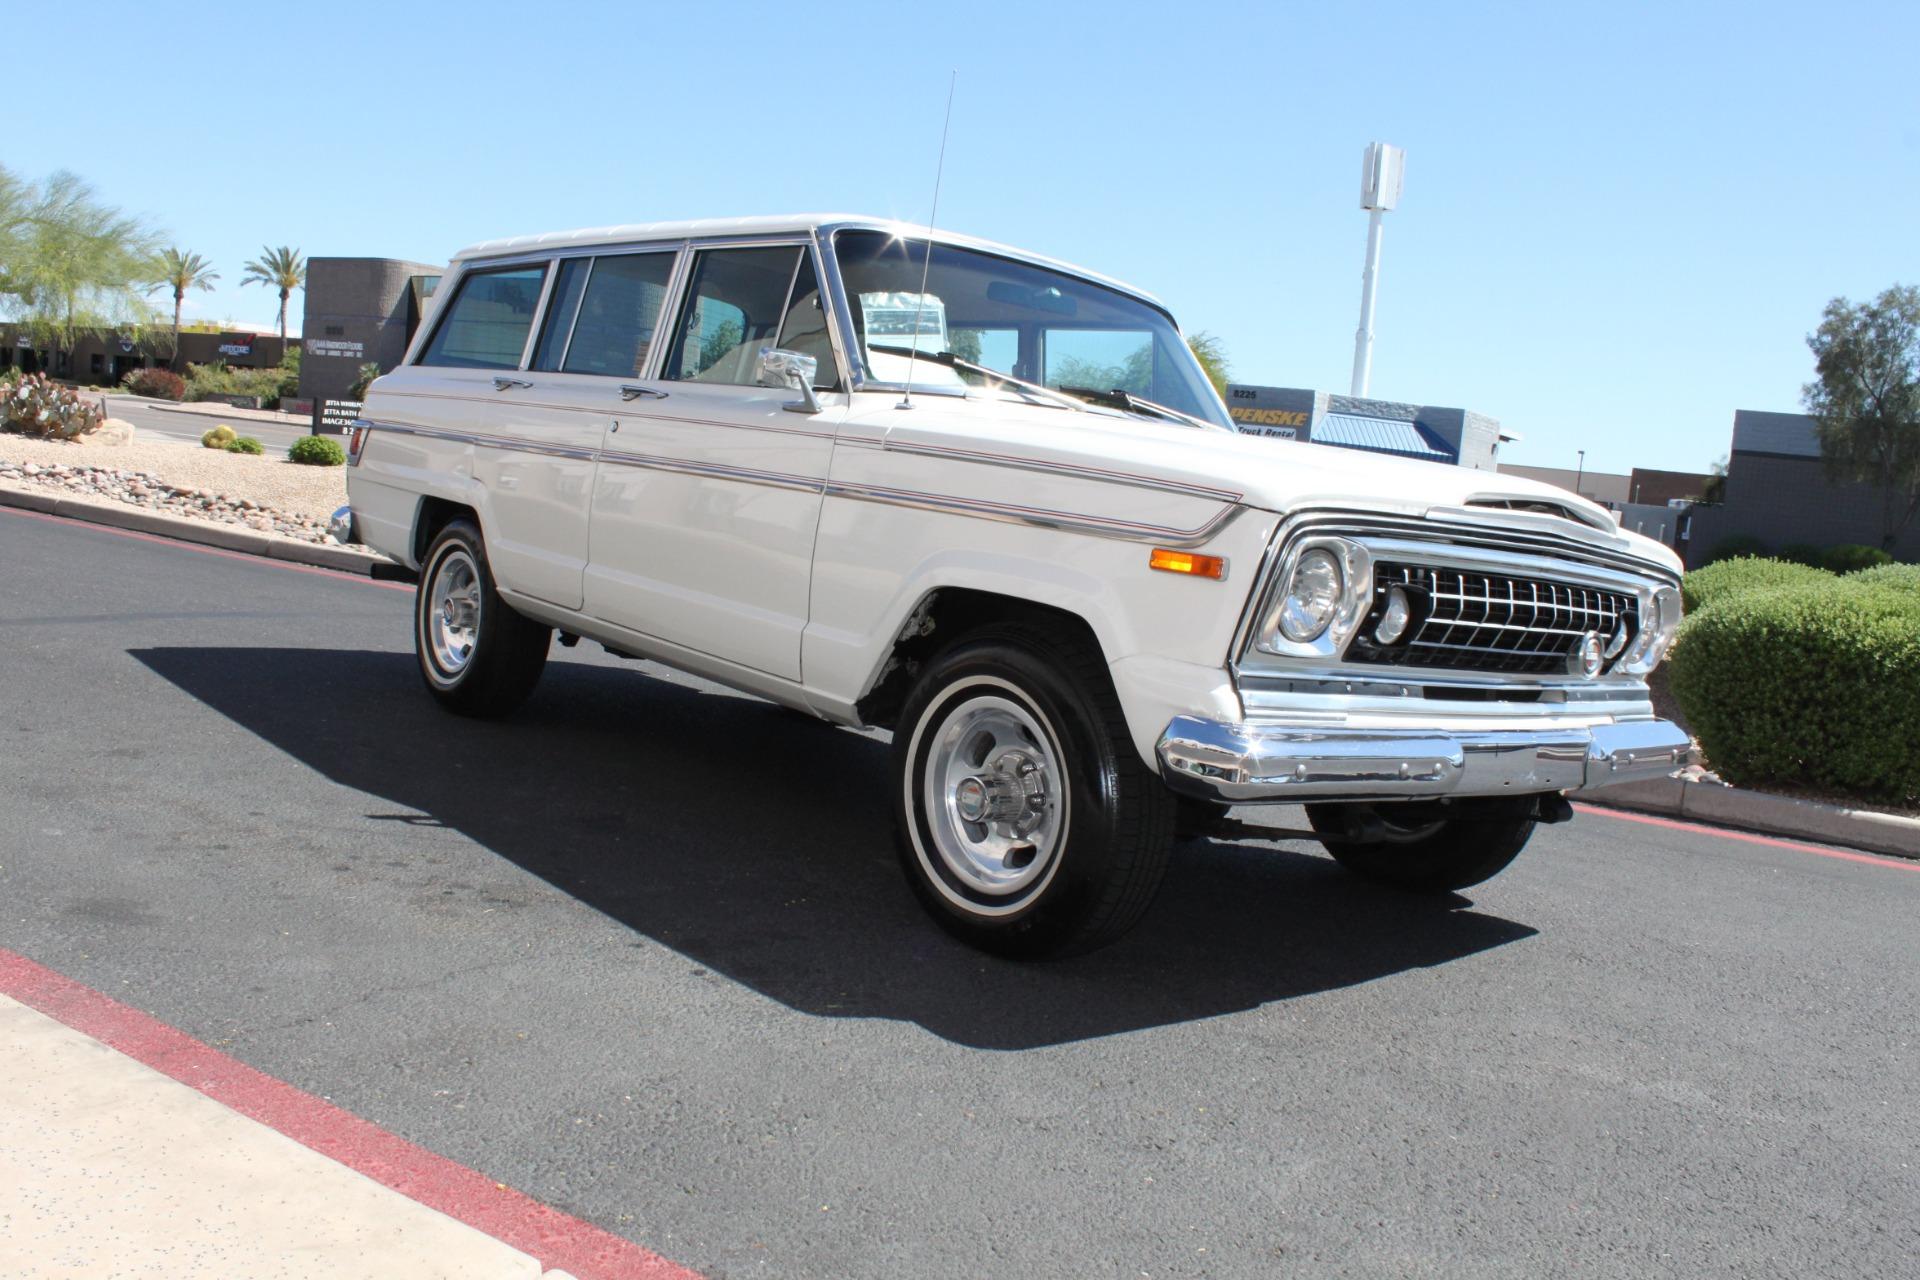 Used-1977-Jeep-Wagoneer-Custom-Fuel-Injected-66-Liter-401-LS430